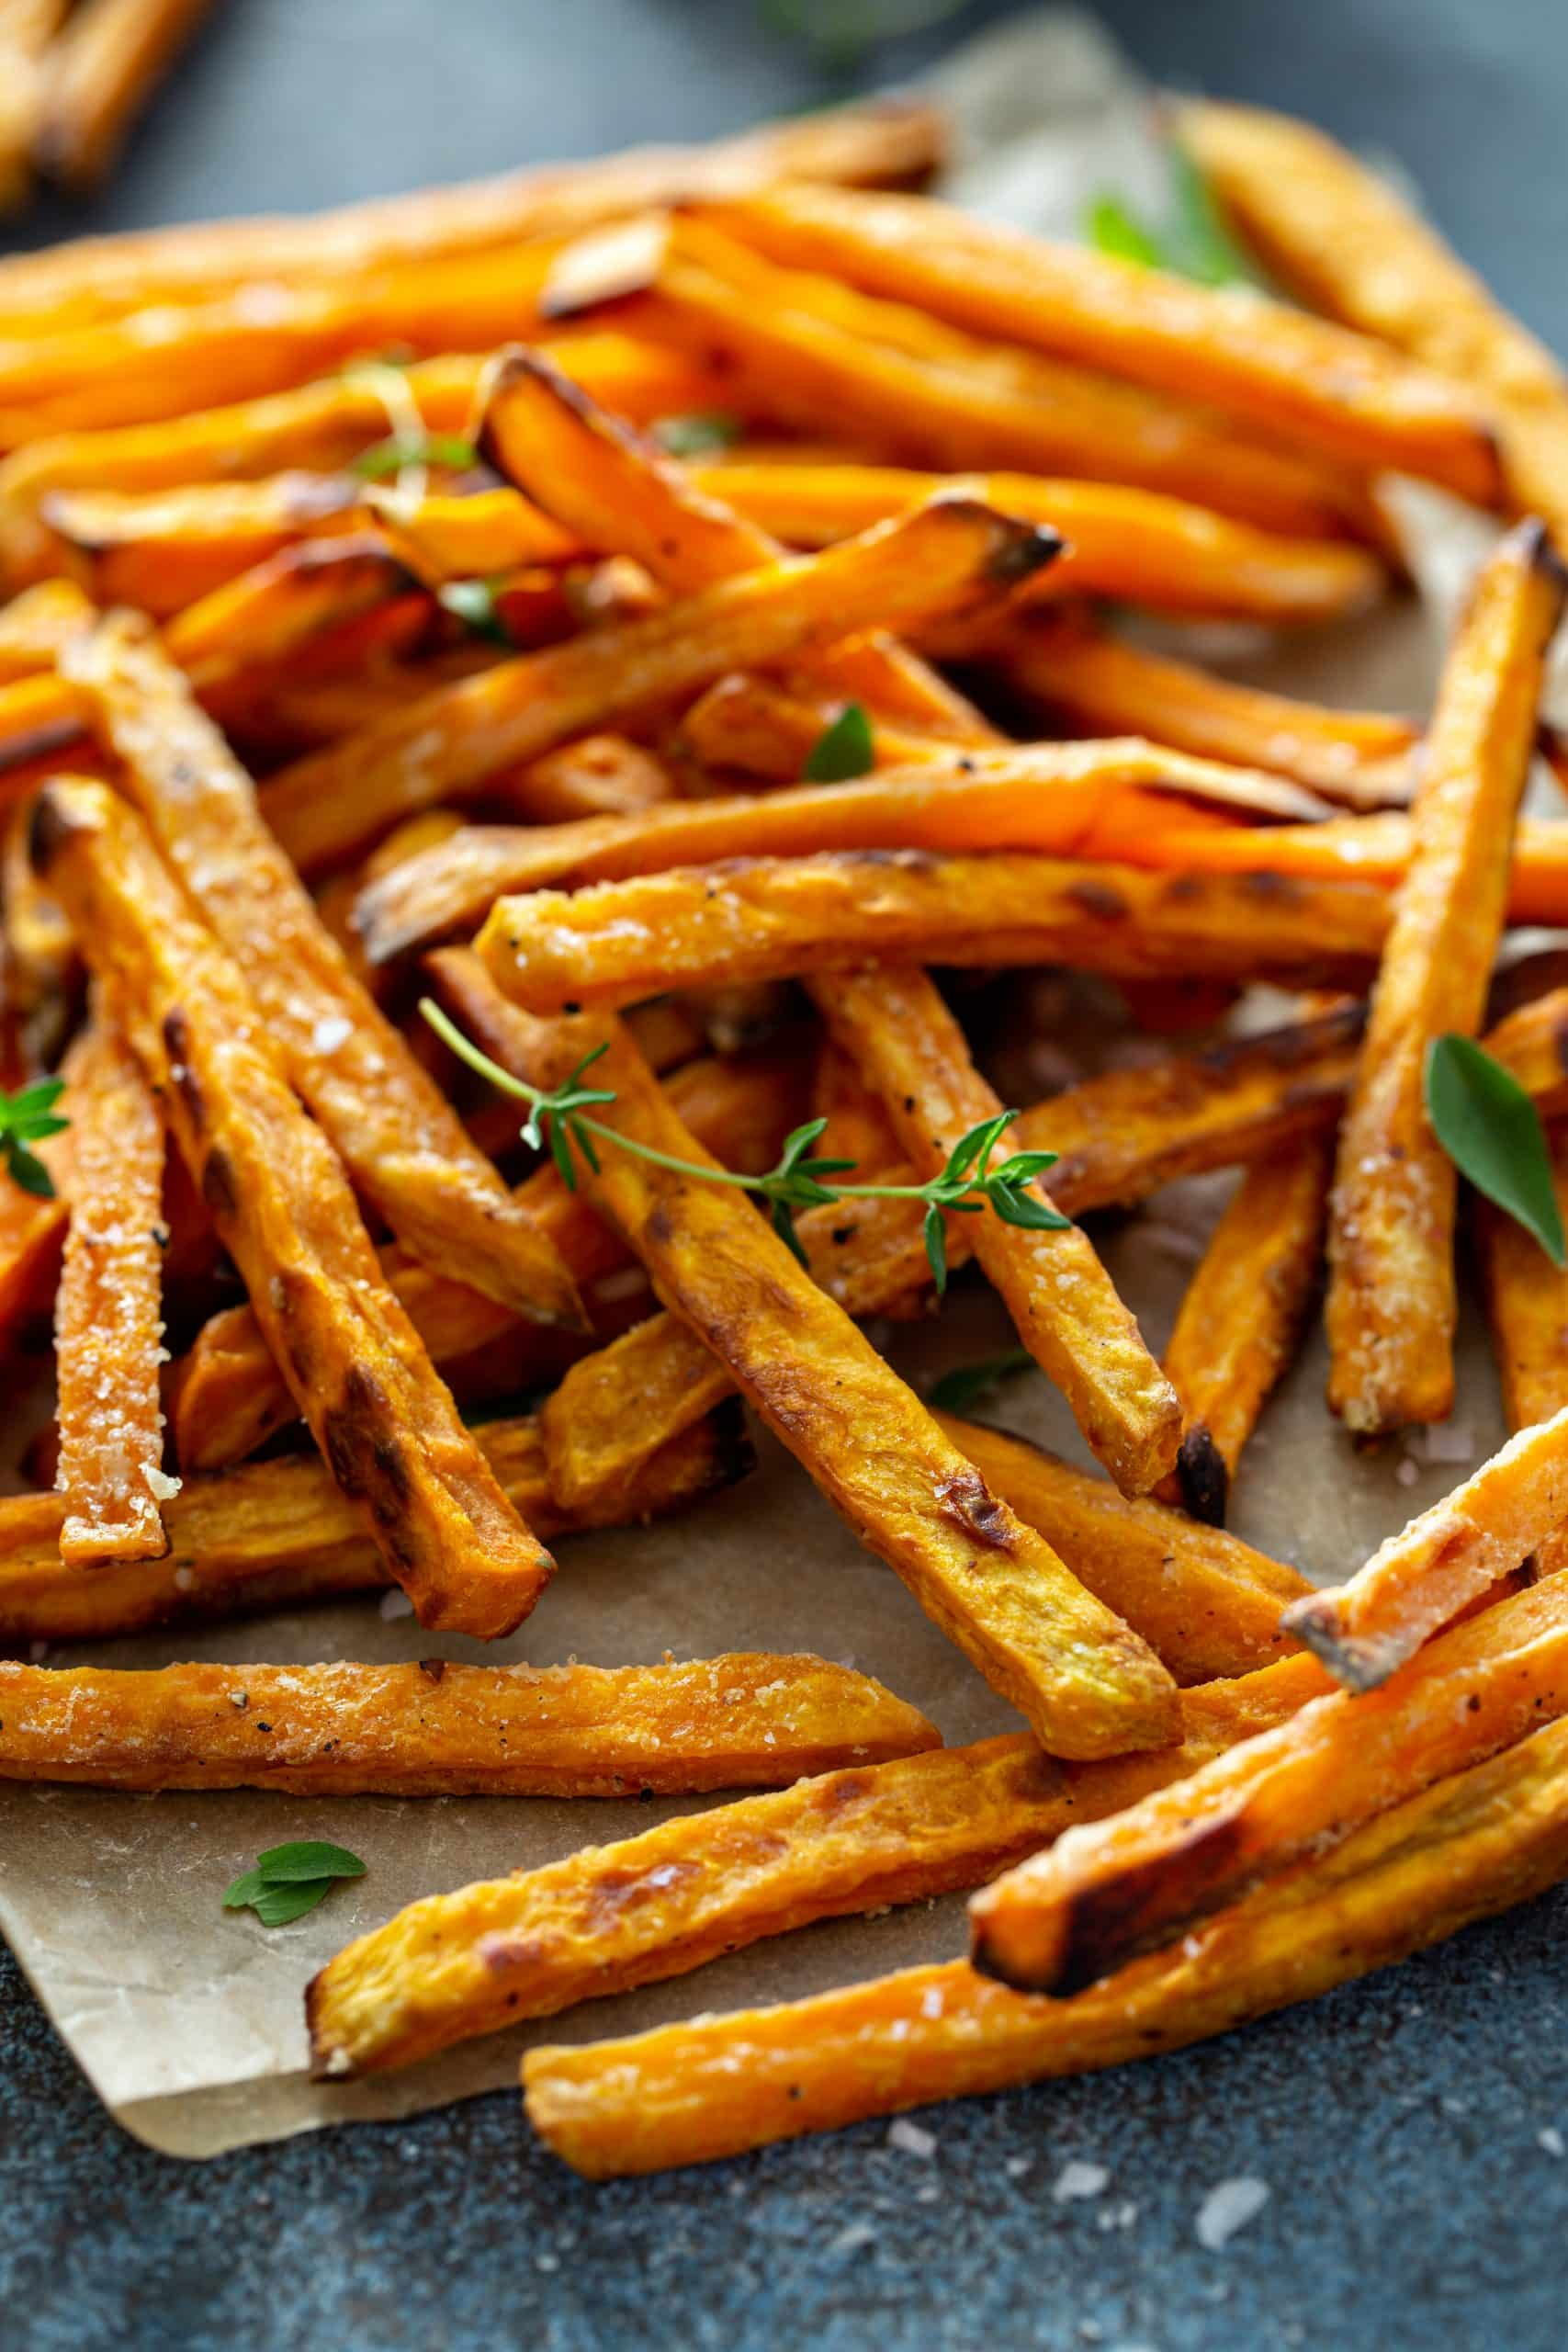 Oven-Baked Sweet Potato Fries (Oil-Free)